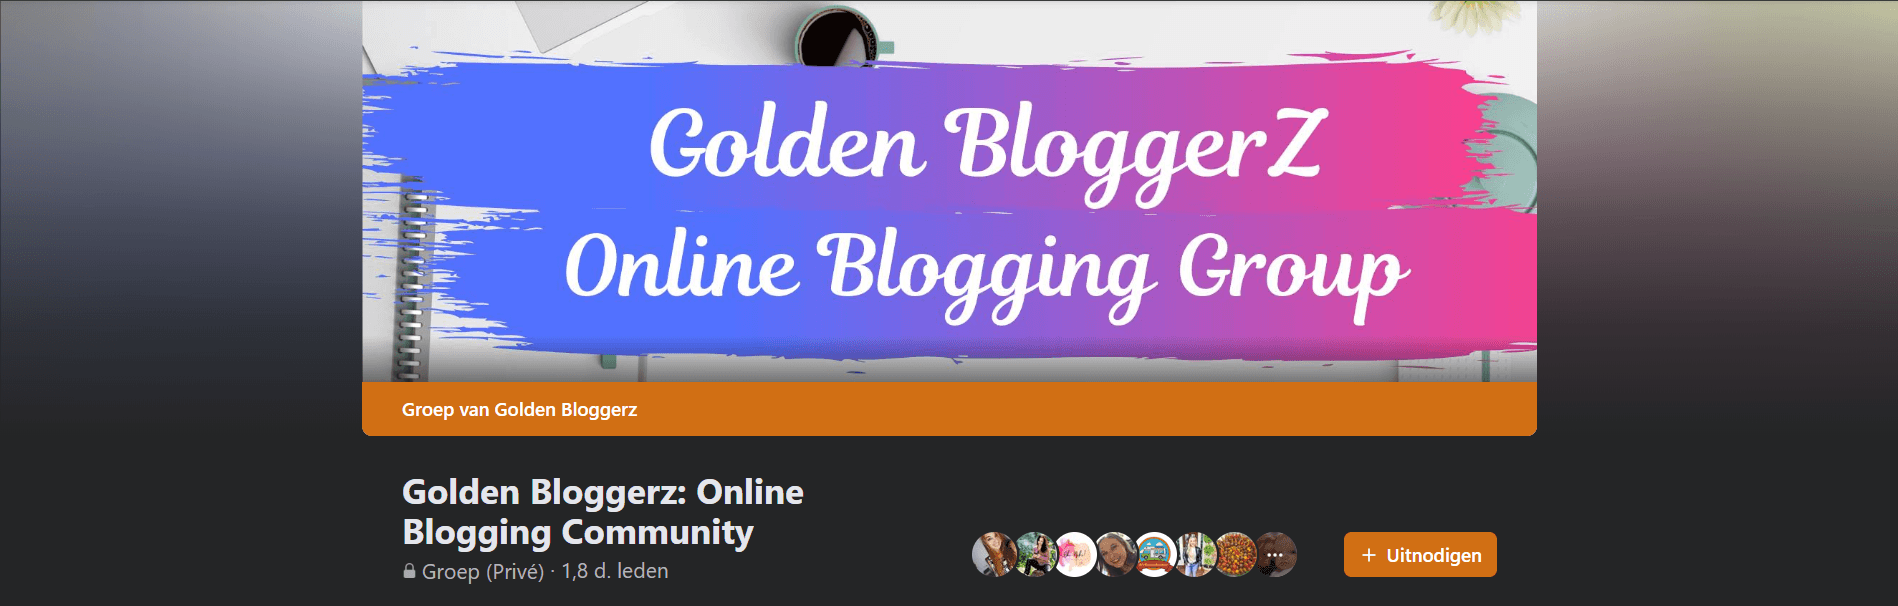 Golden Bloggerz online blogging group